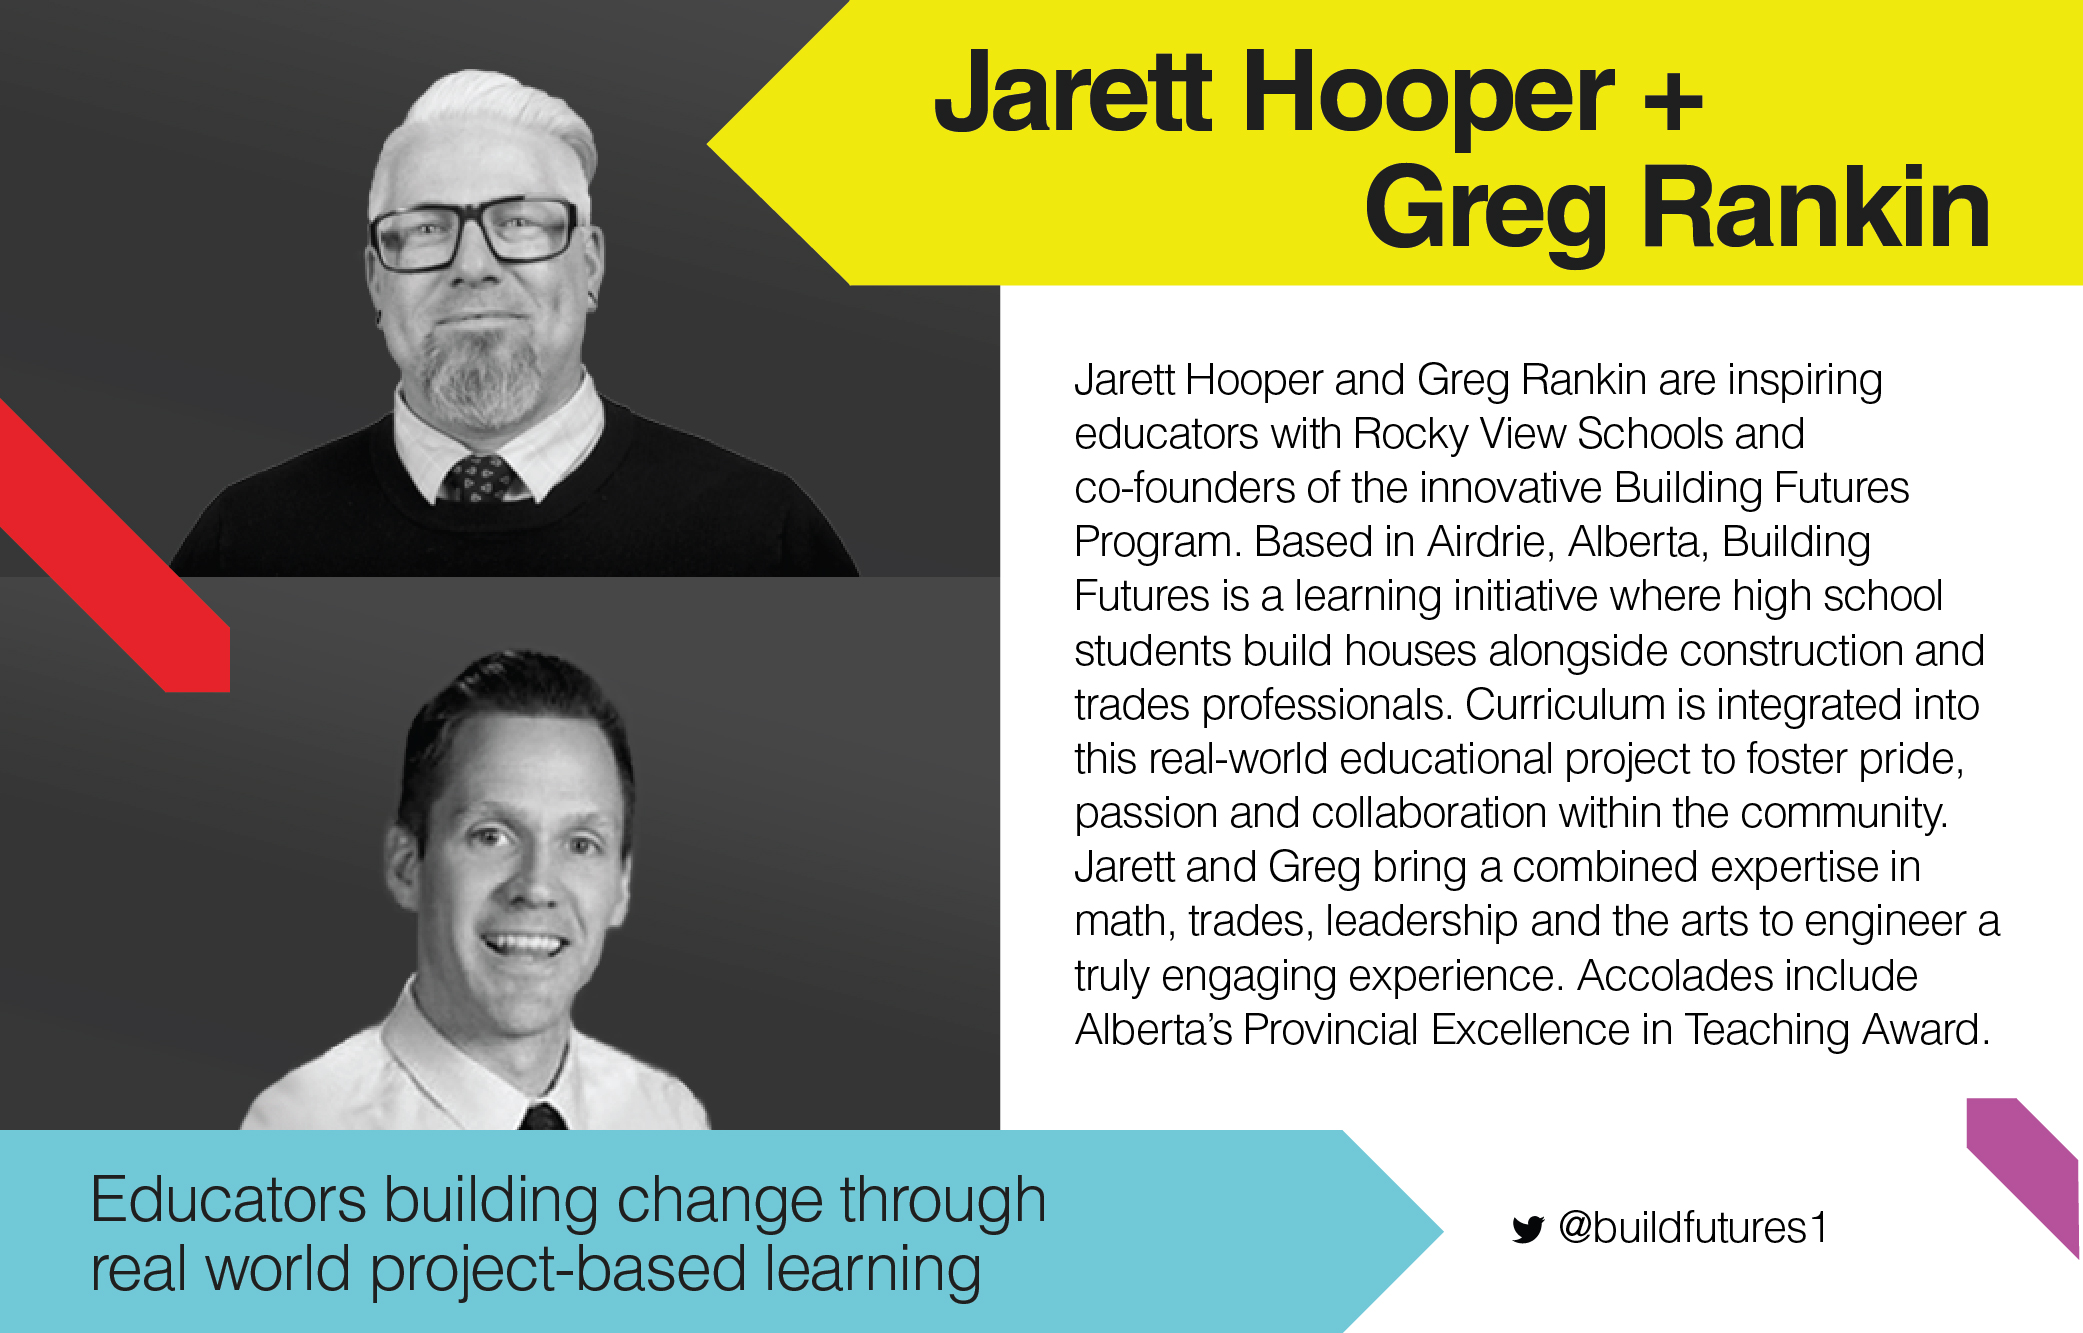 TEDxYYC 2017 presents Jarett Hooper & Greg Rankin